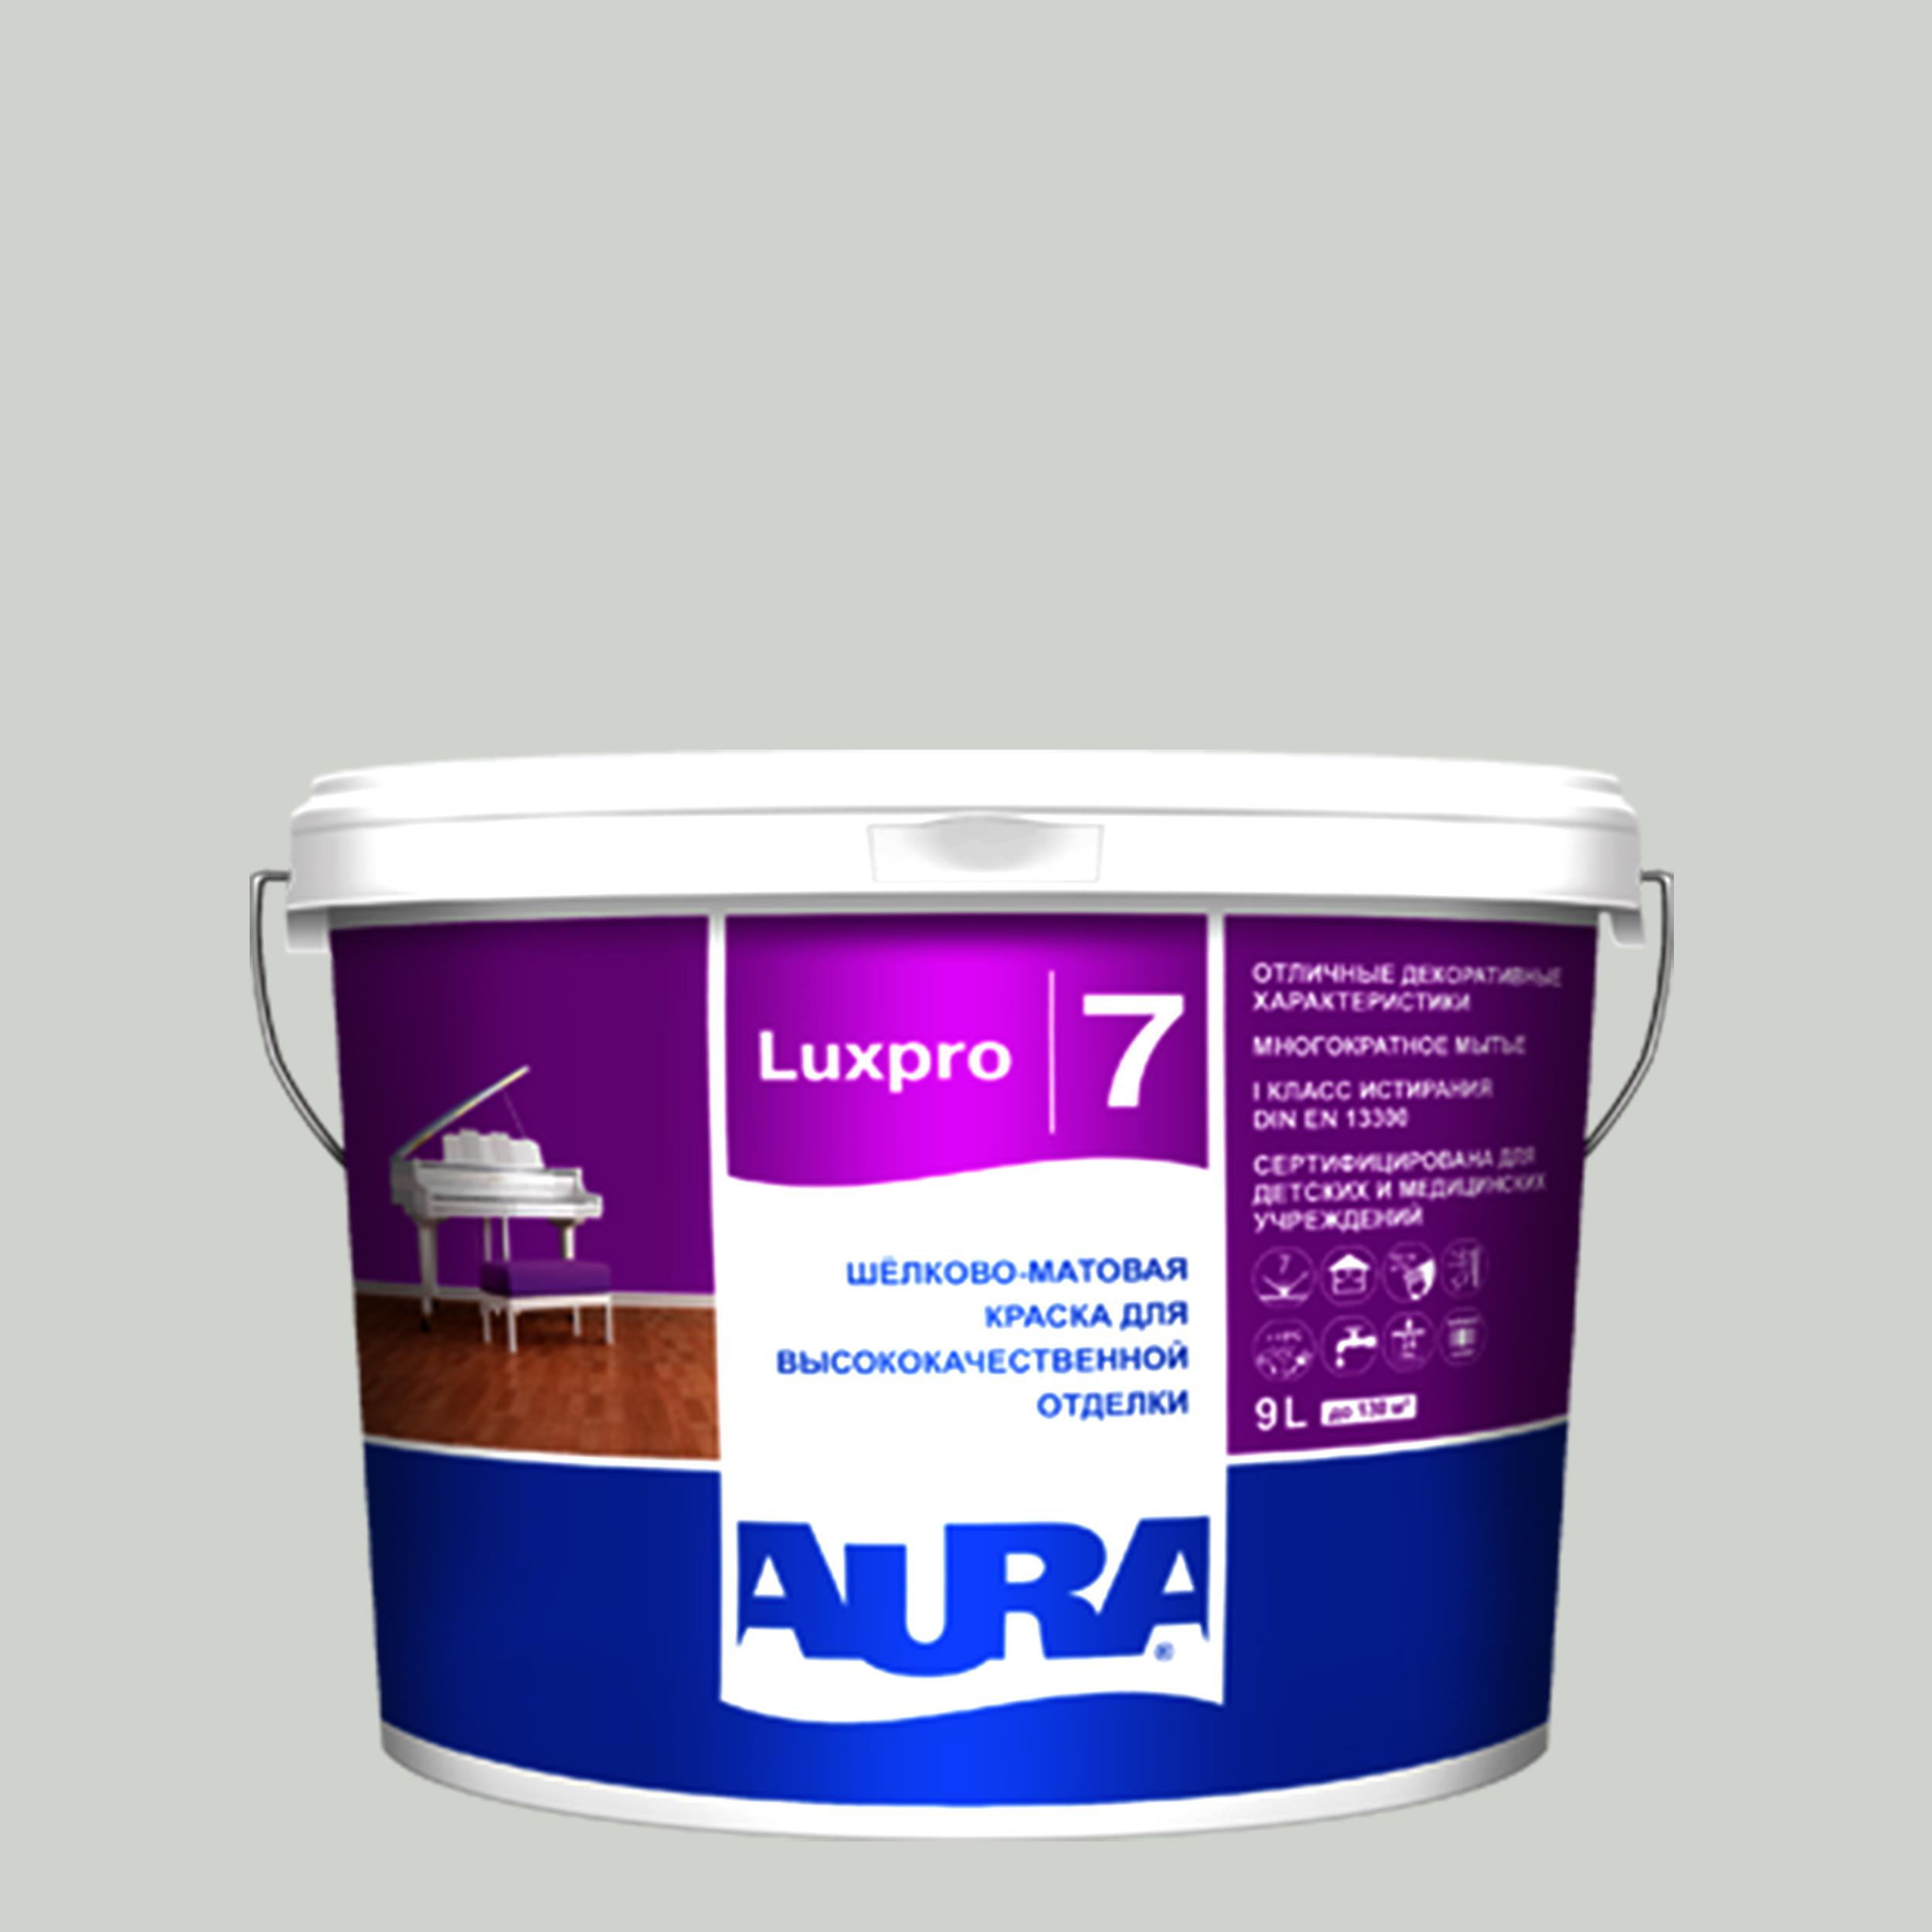 Фото 4 - Краска интерьерная, Aura LuxPRO 7, RAL 5023, 11 кг.